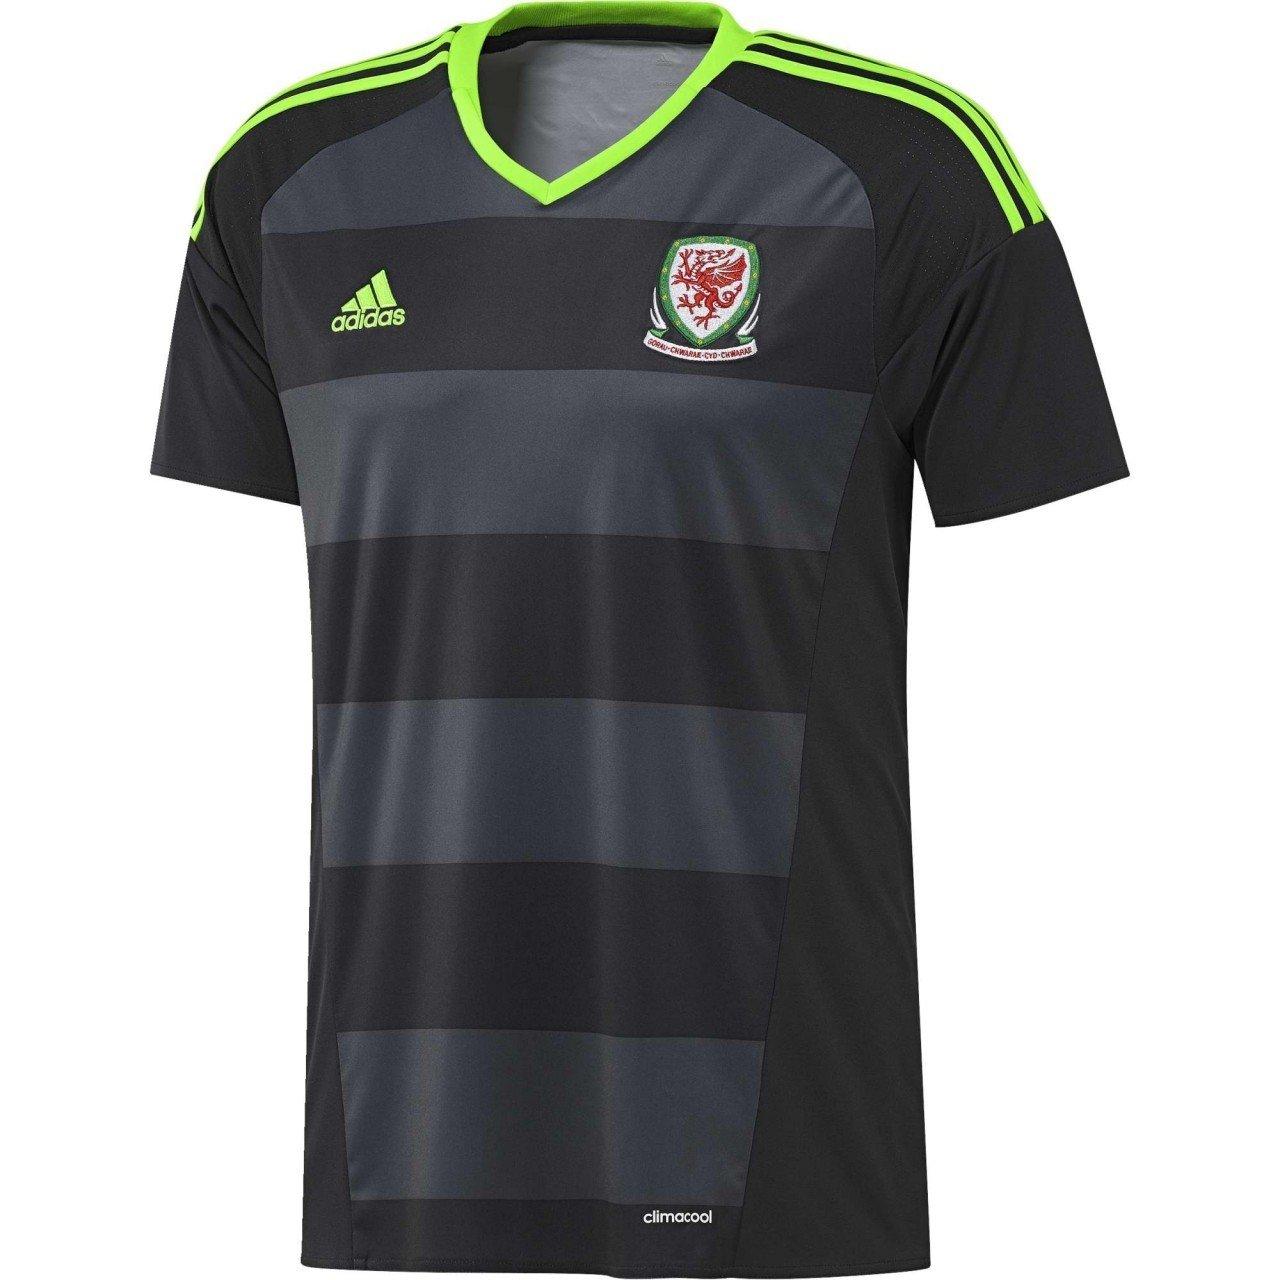 timeless design 504b2 c0a39 2016-2017 Wales Away Adidas Football Shirt, Jerseys - Amazon ...